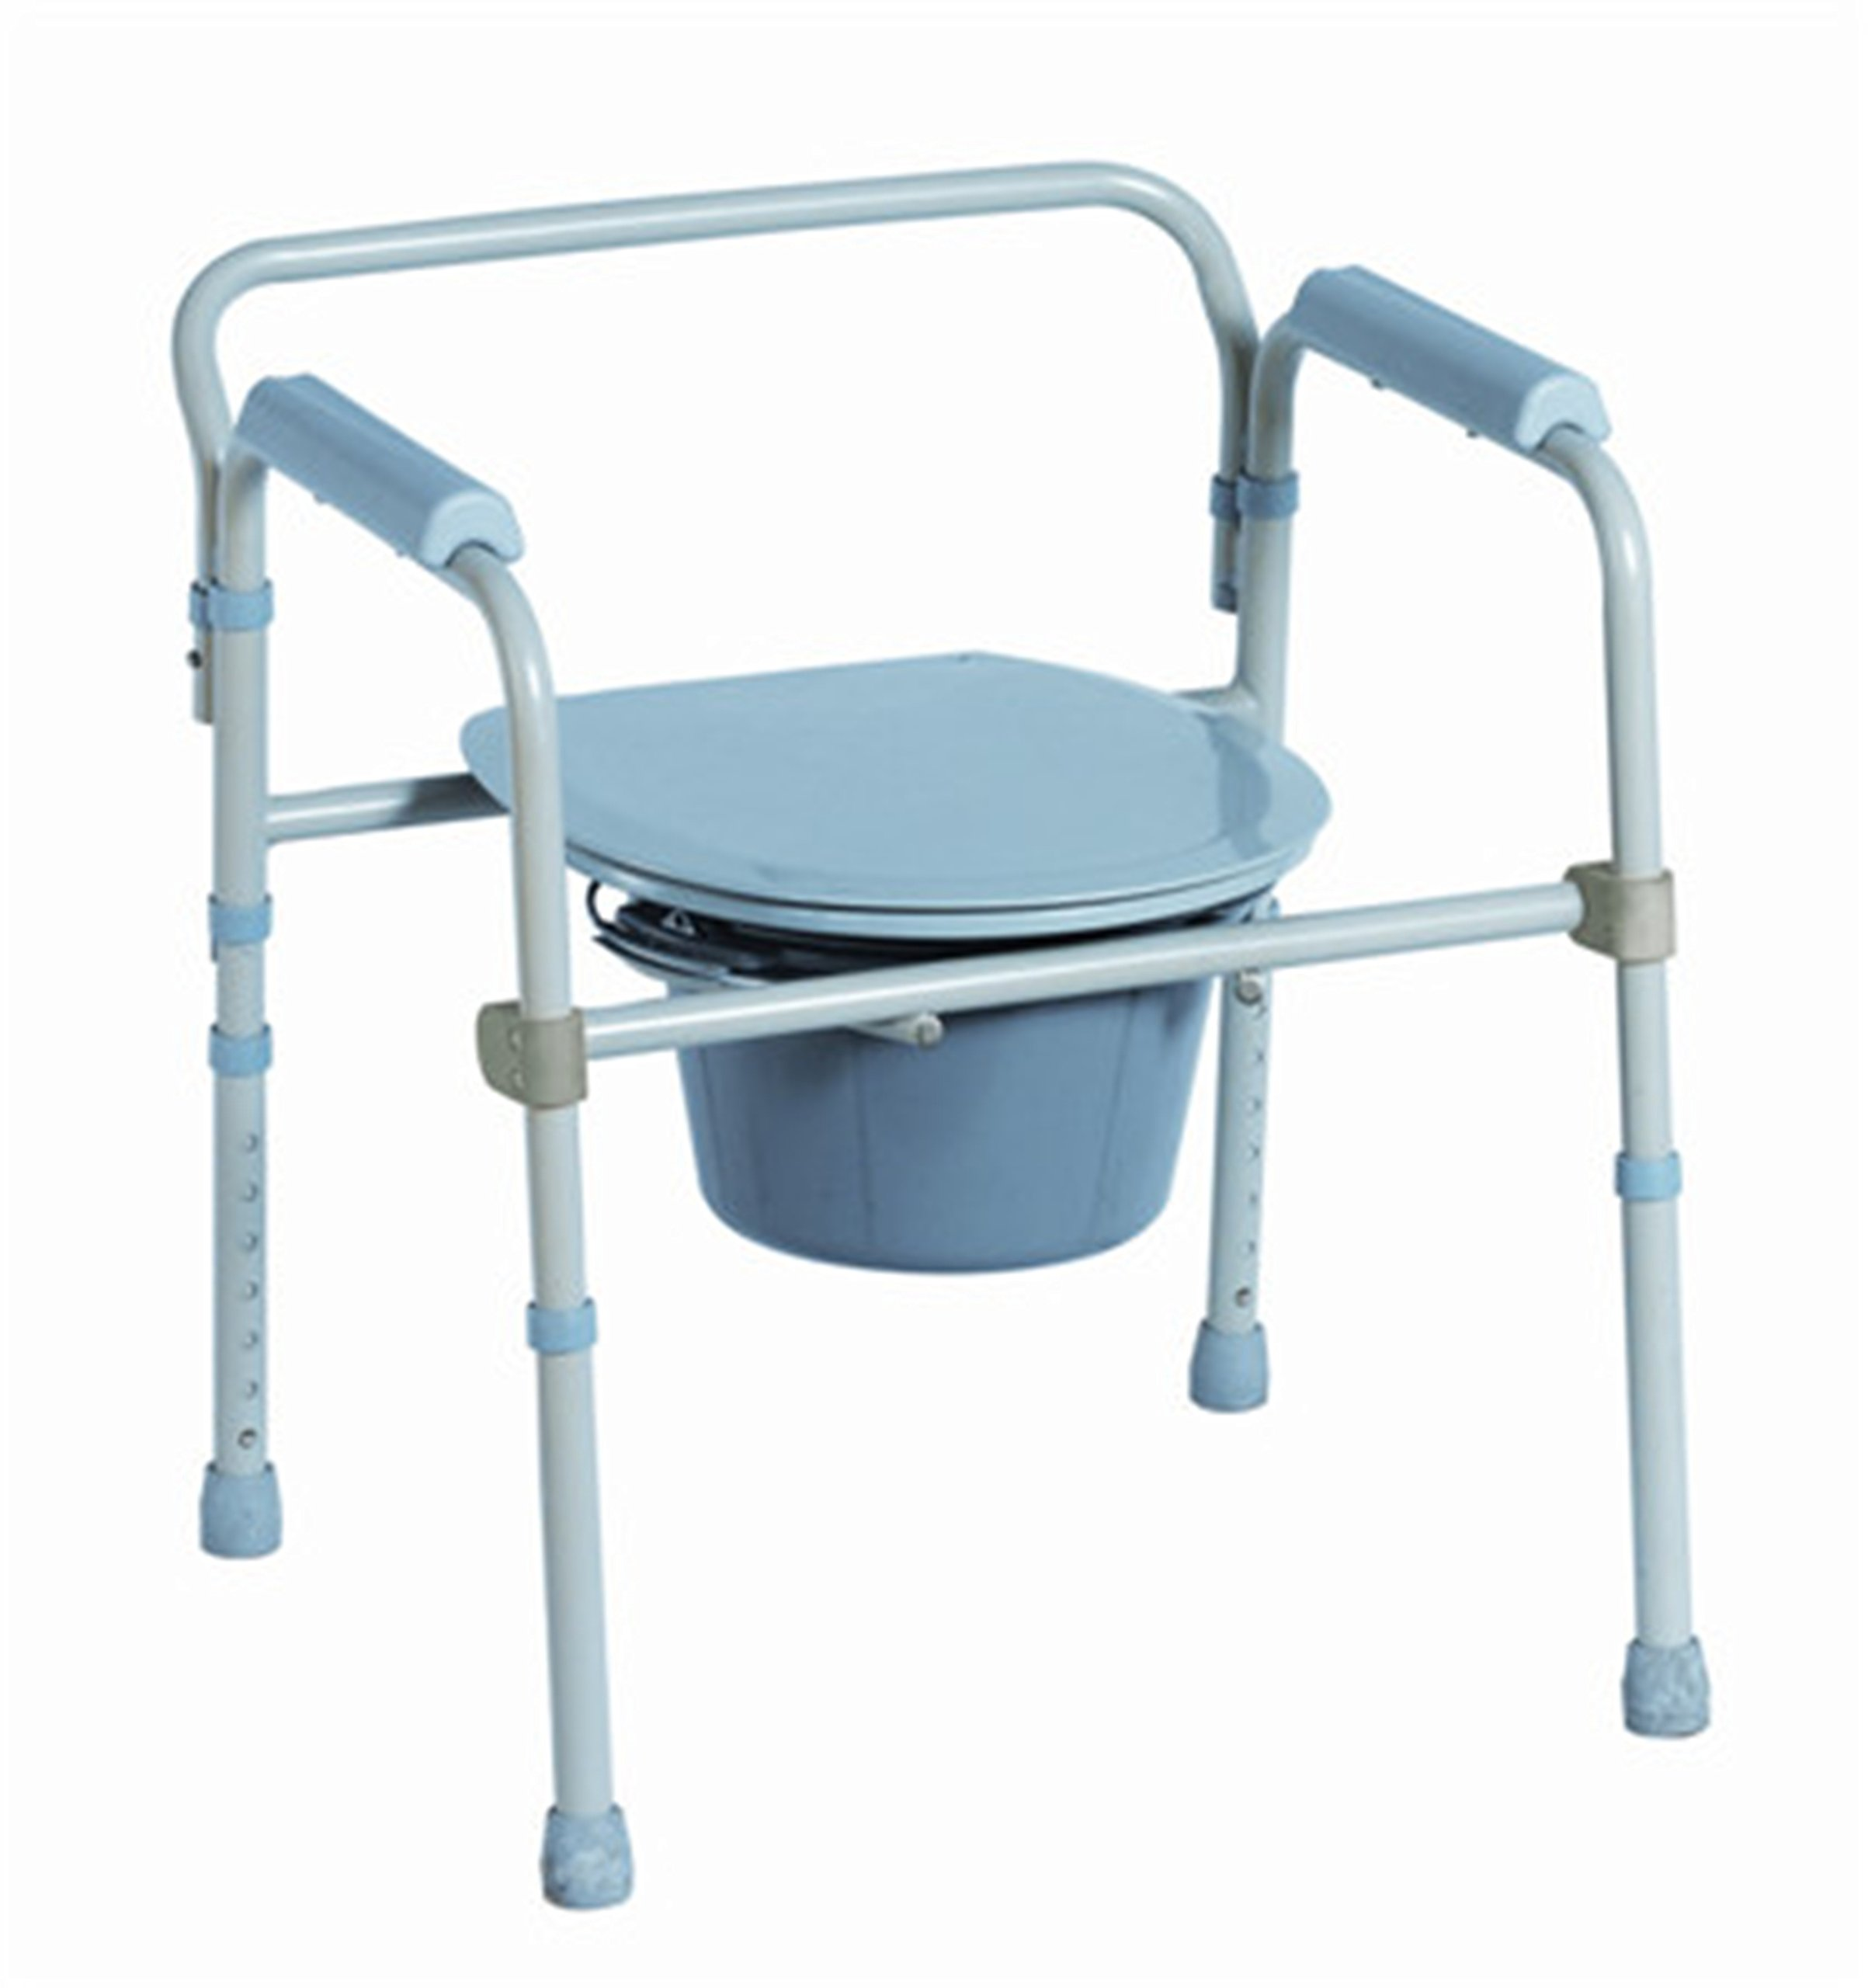 Rehabilitation Advantage Steel Folding Commode Chair, Bucket, Handle, Lid, Cover, Splash Shield and Seat